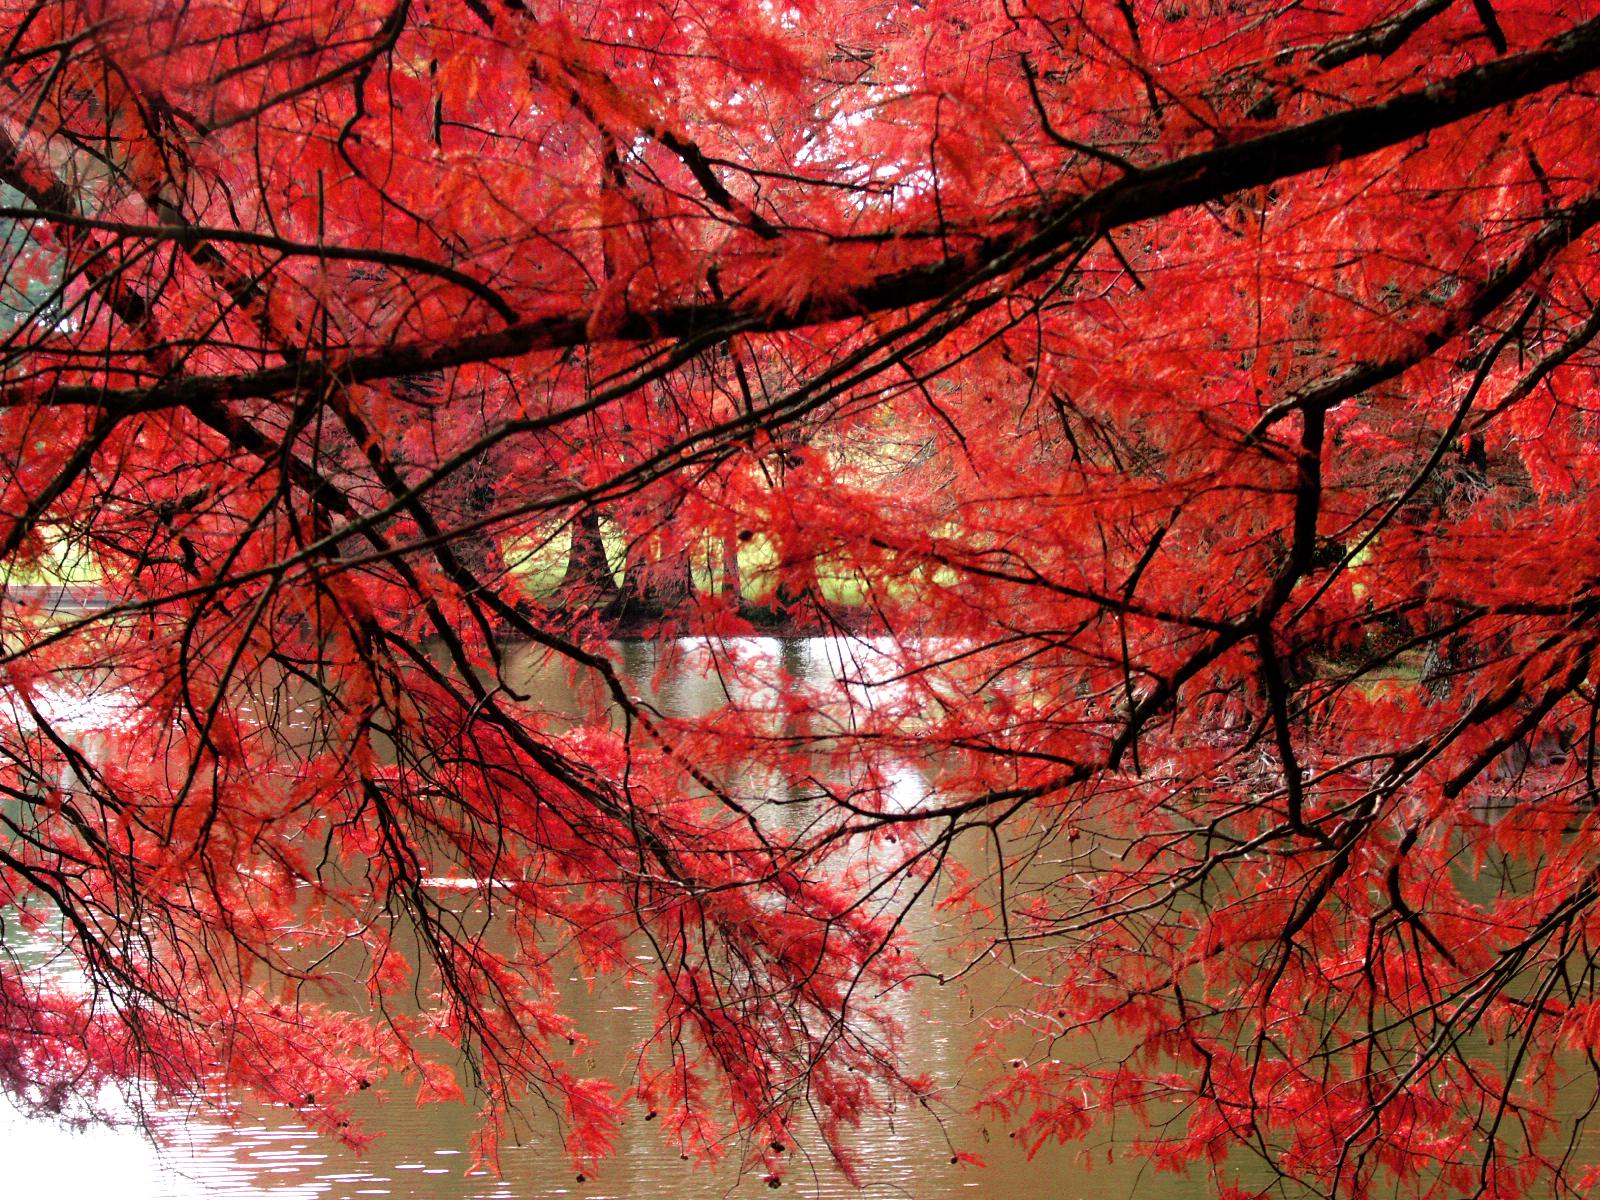 Banilung: Red Wallpaper Designs